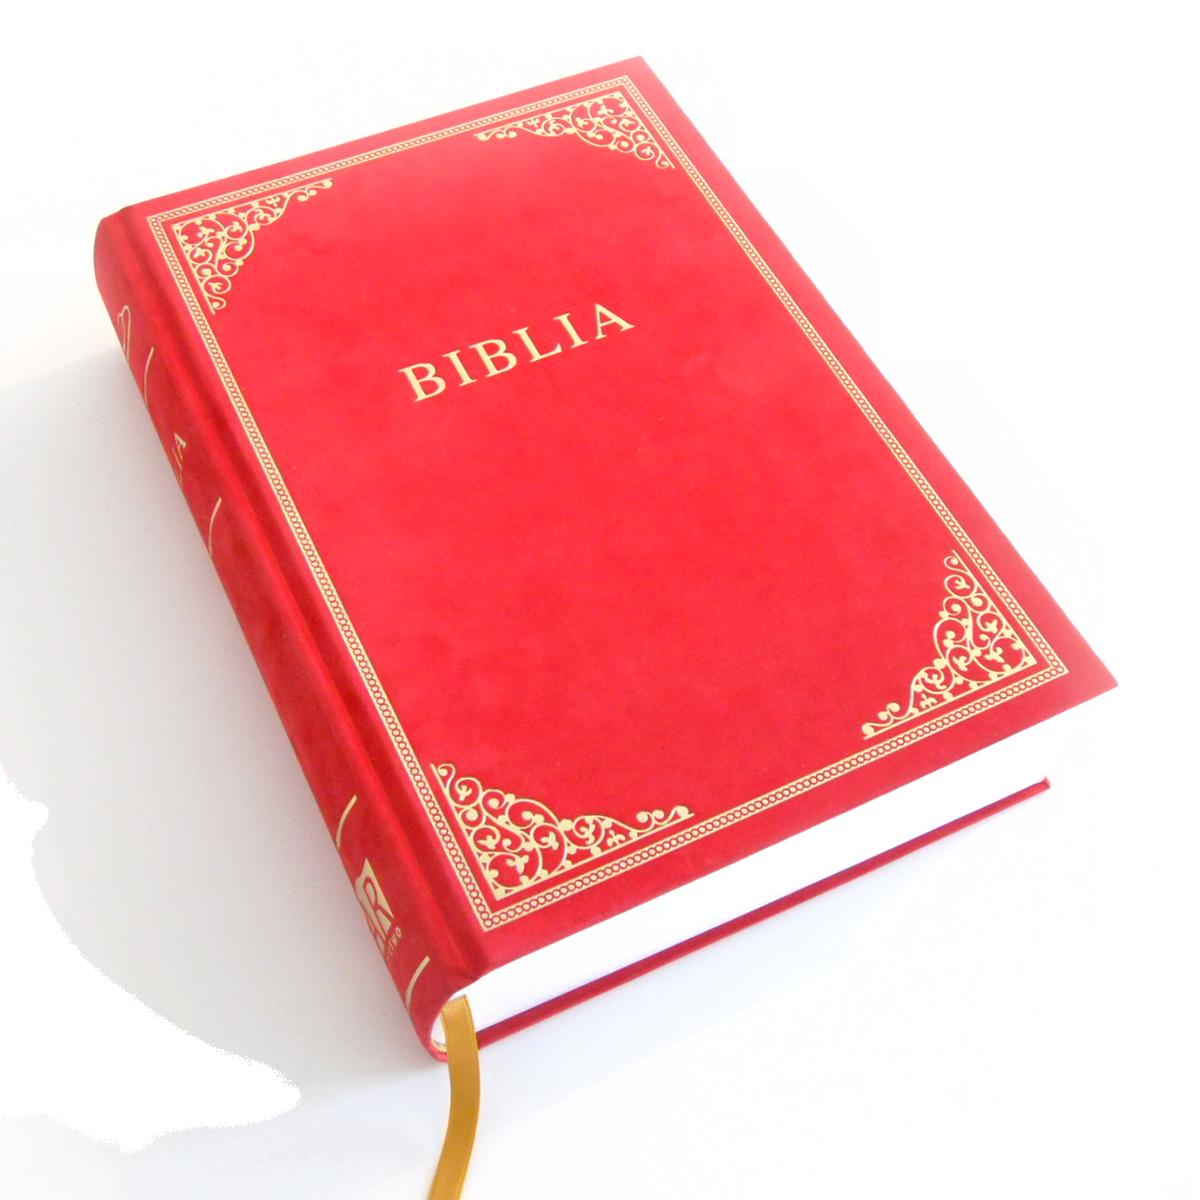 Biblia Png (72+ images).